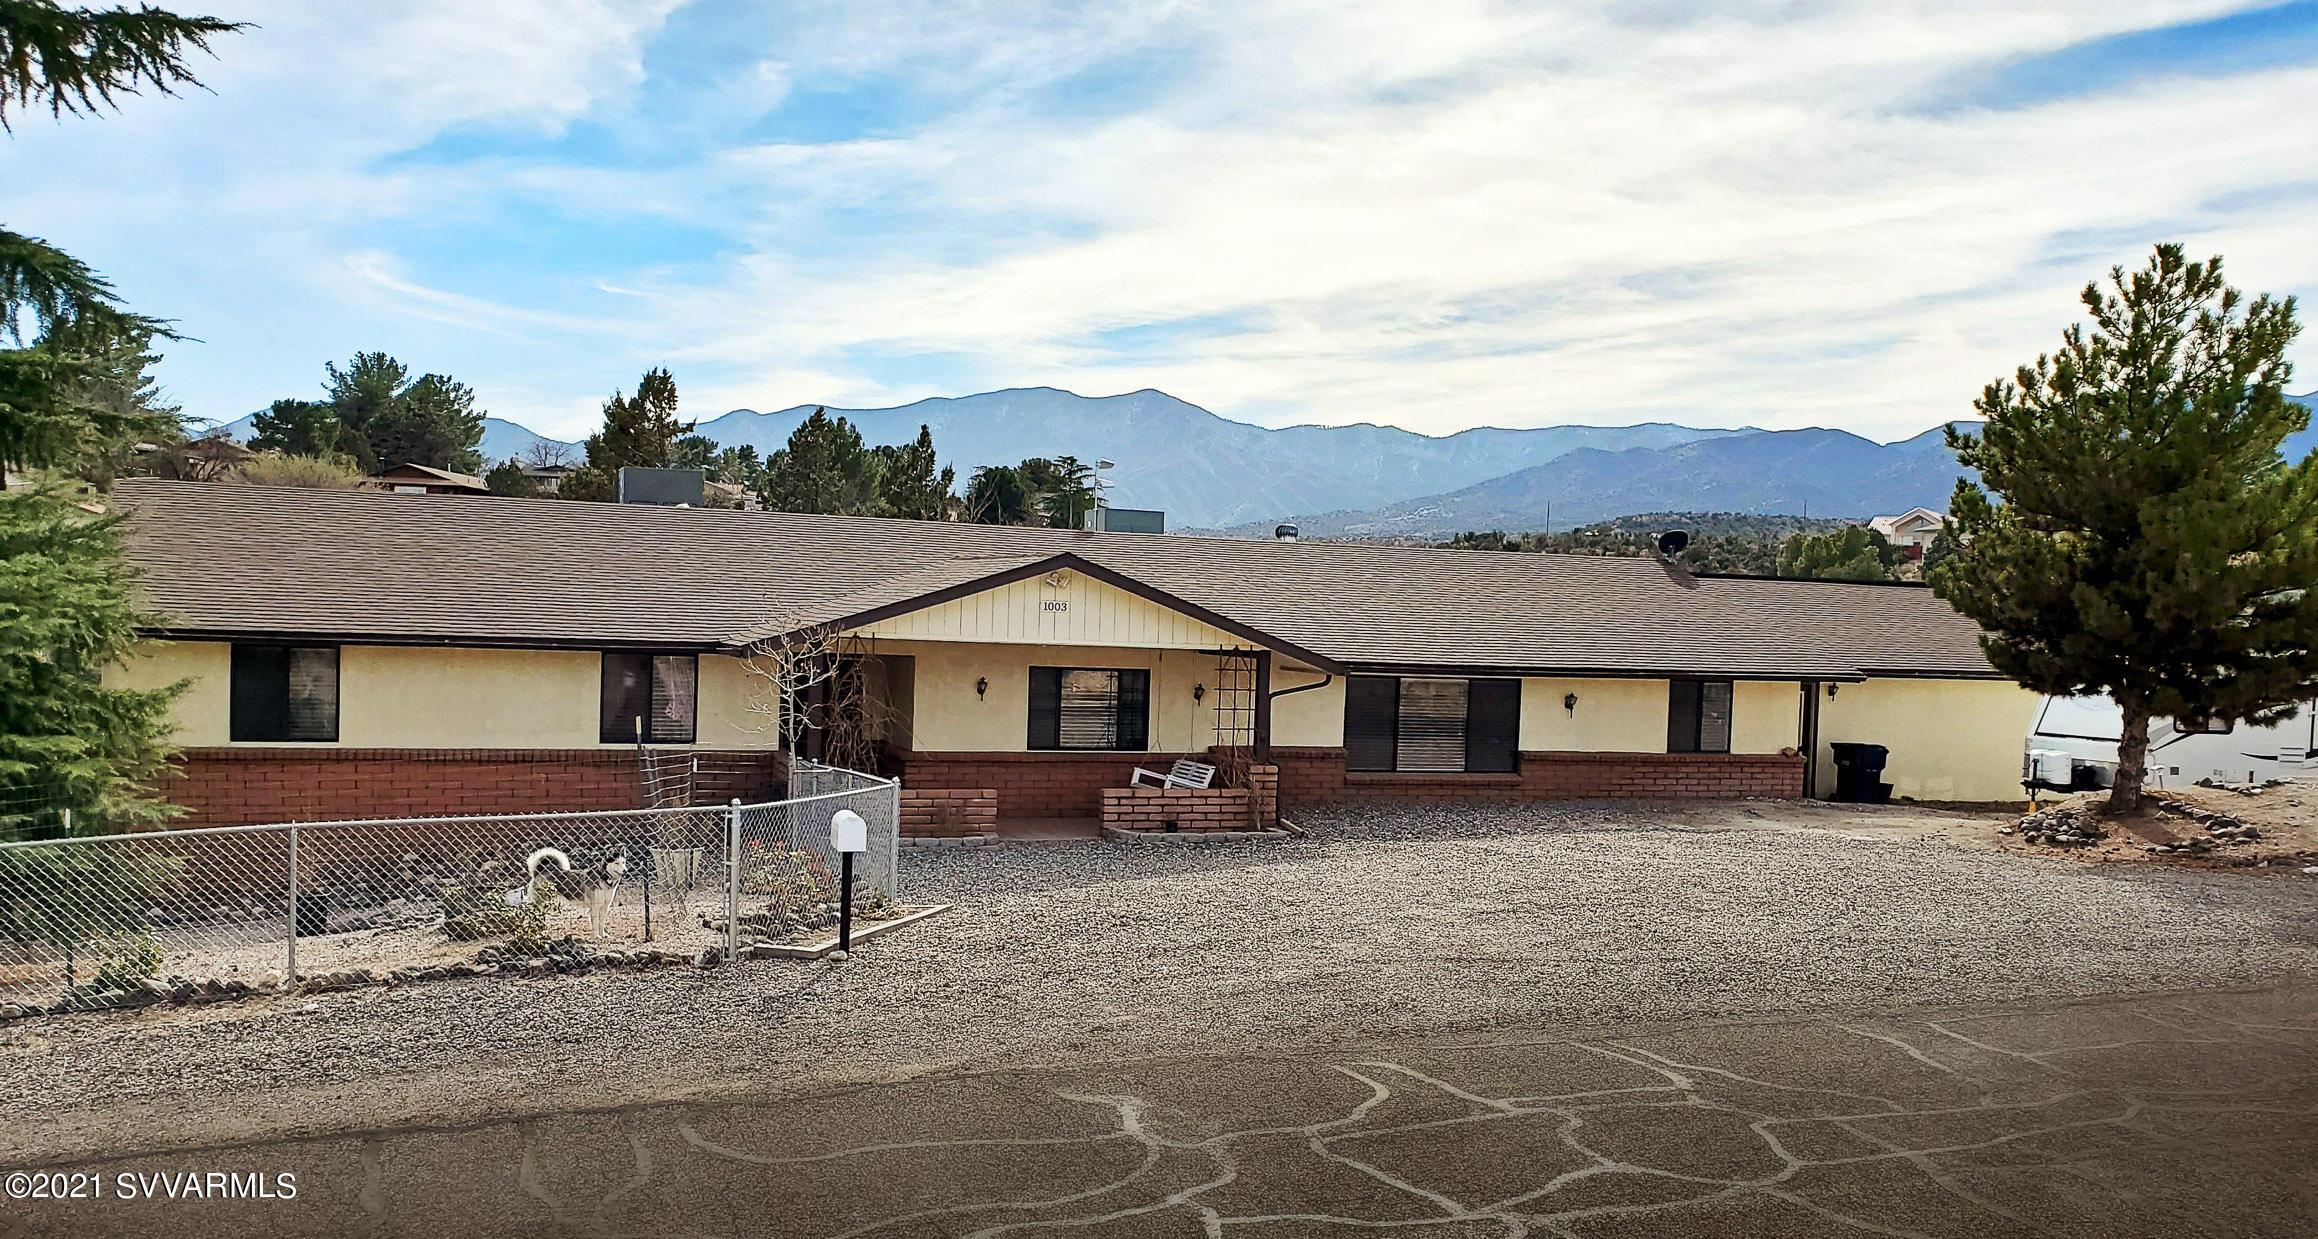 1003 Desert Jewel Drive Cottonwood, AZ 86326